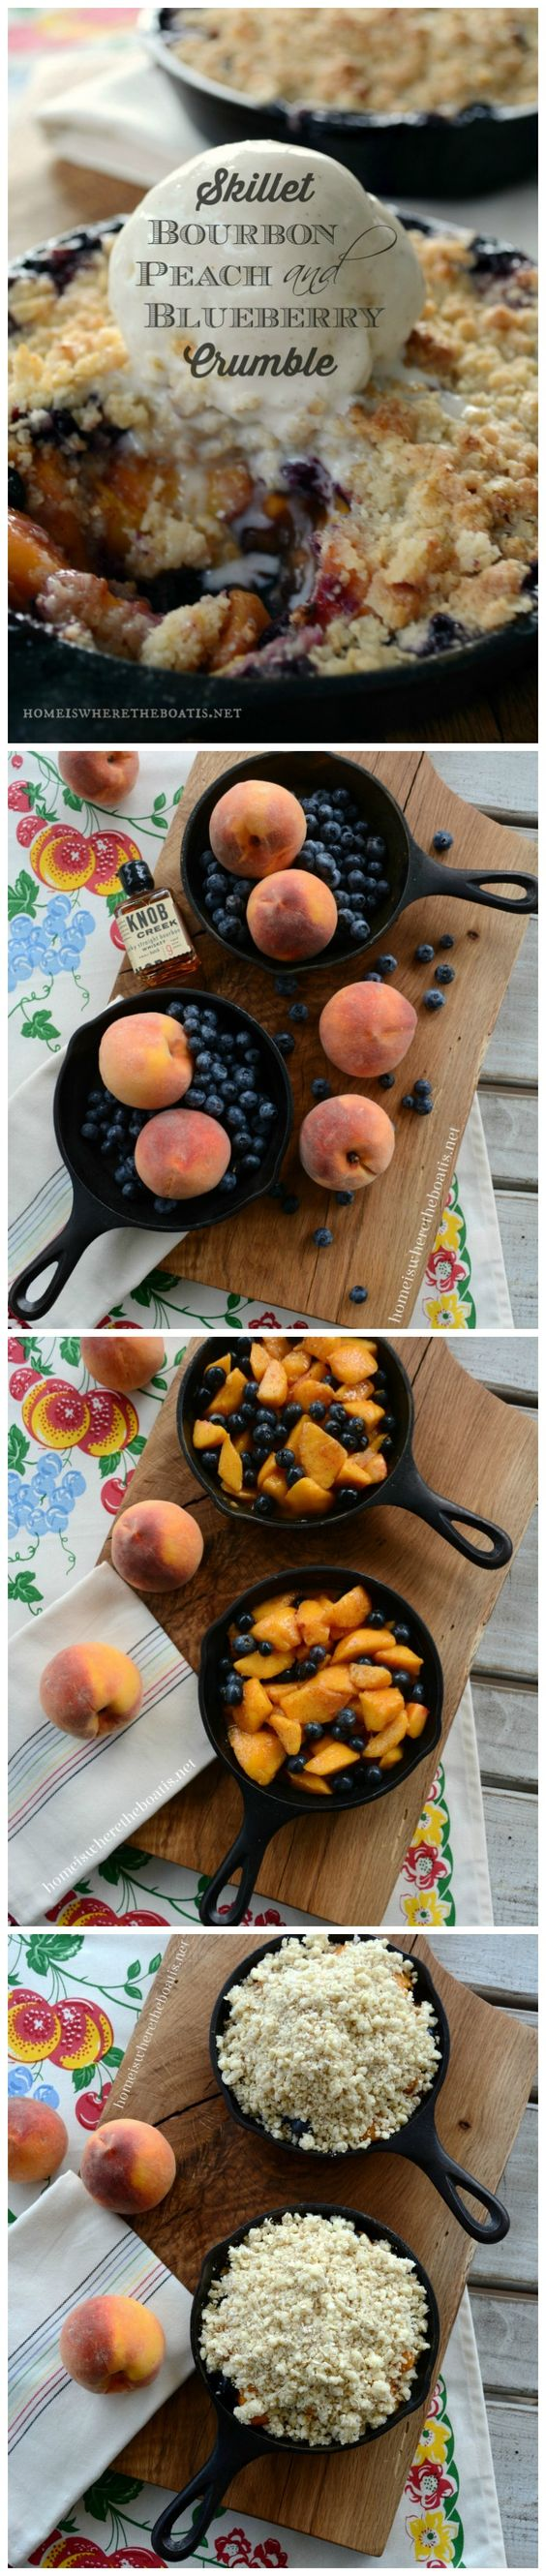 Skillet Bourbon, Peach and Blueberry Crumble! #dessert #summer